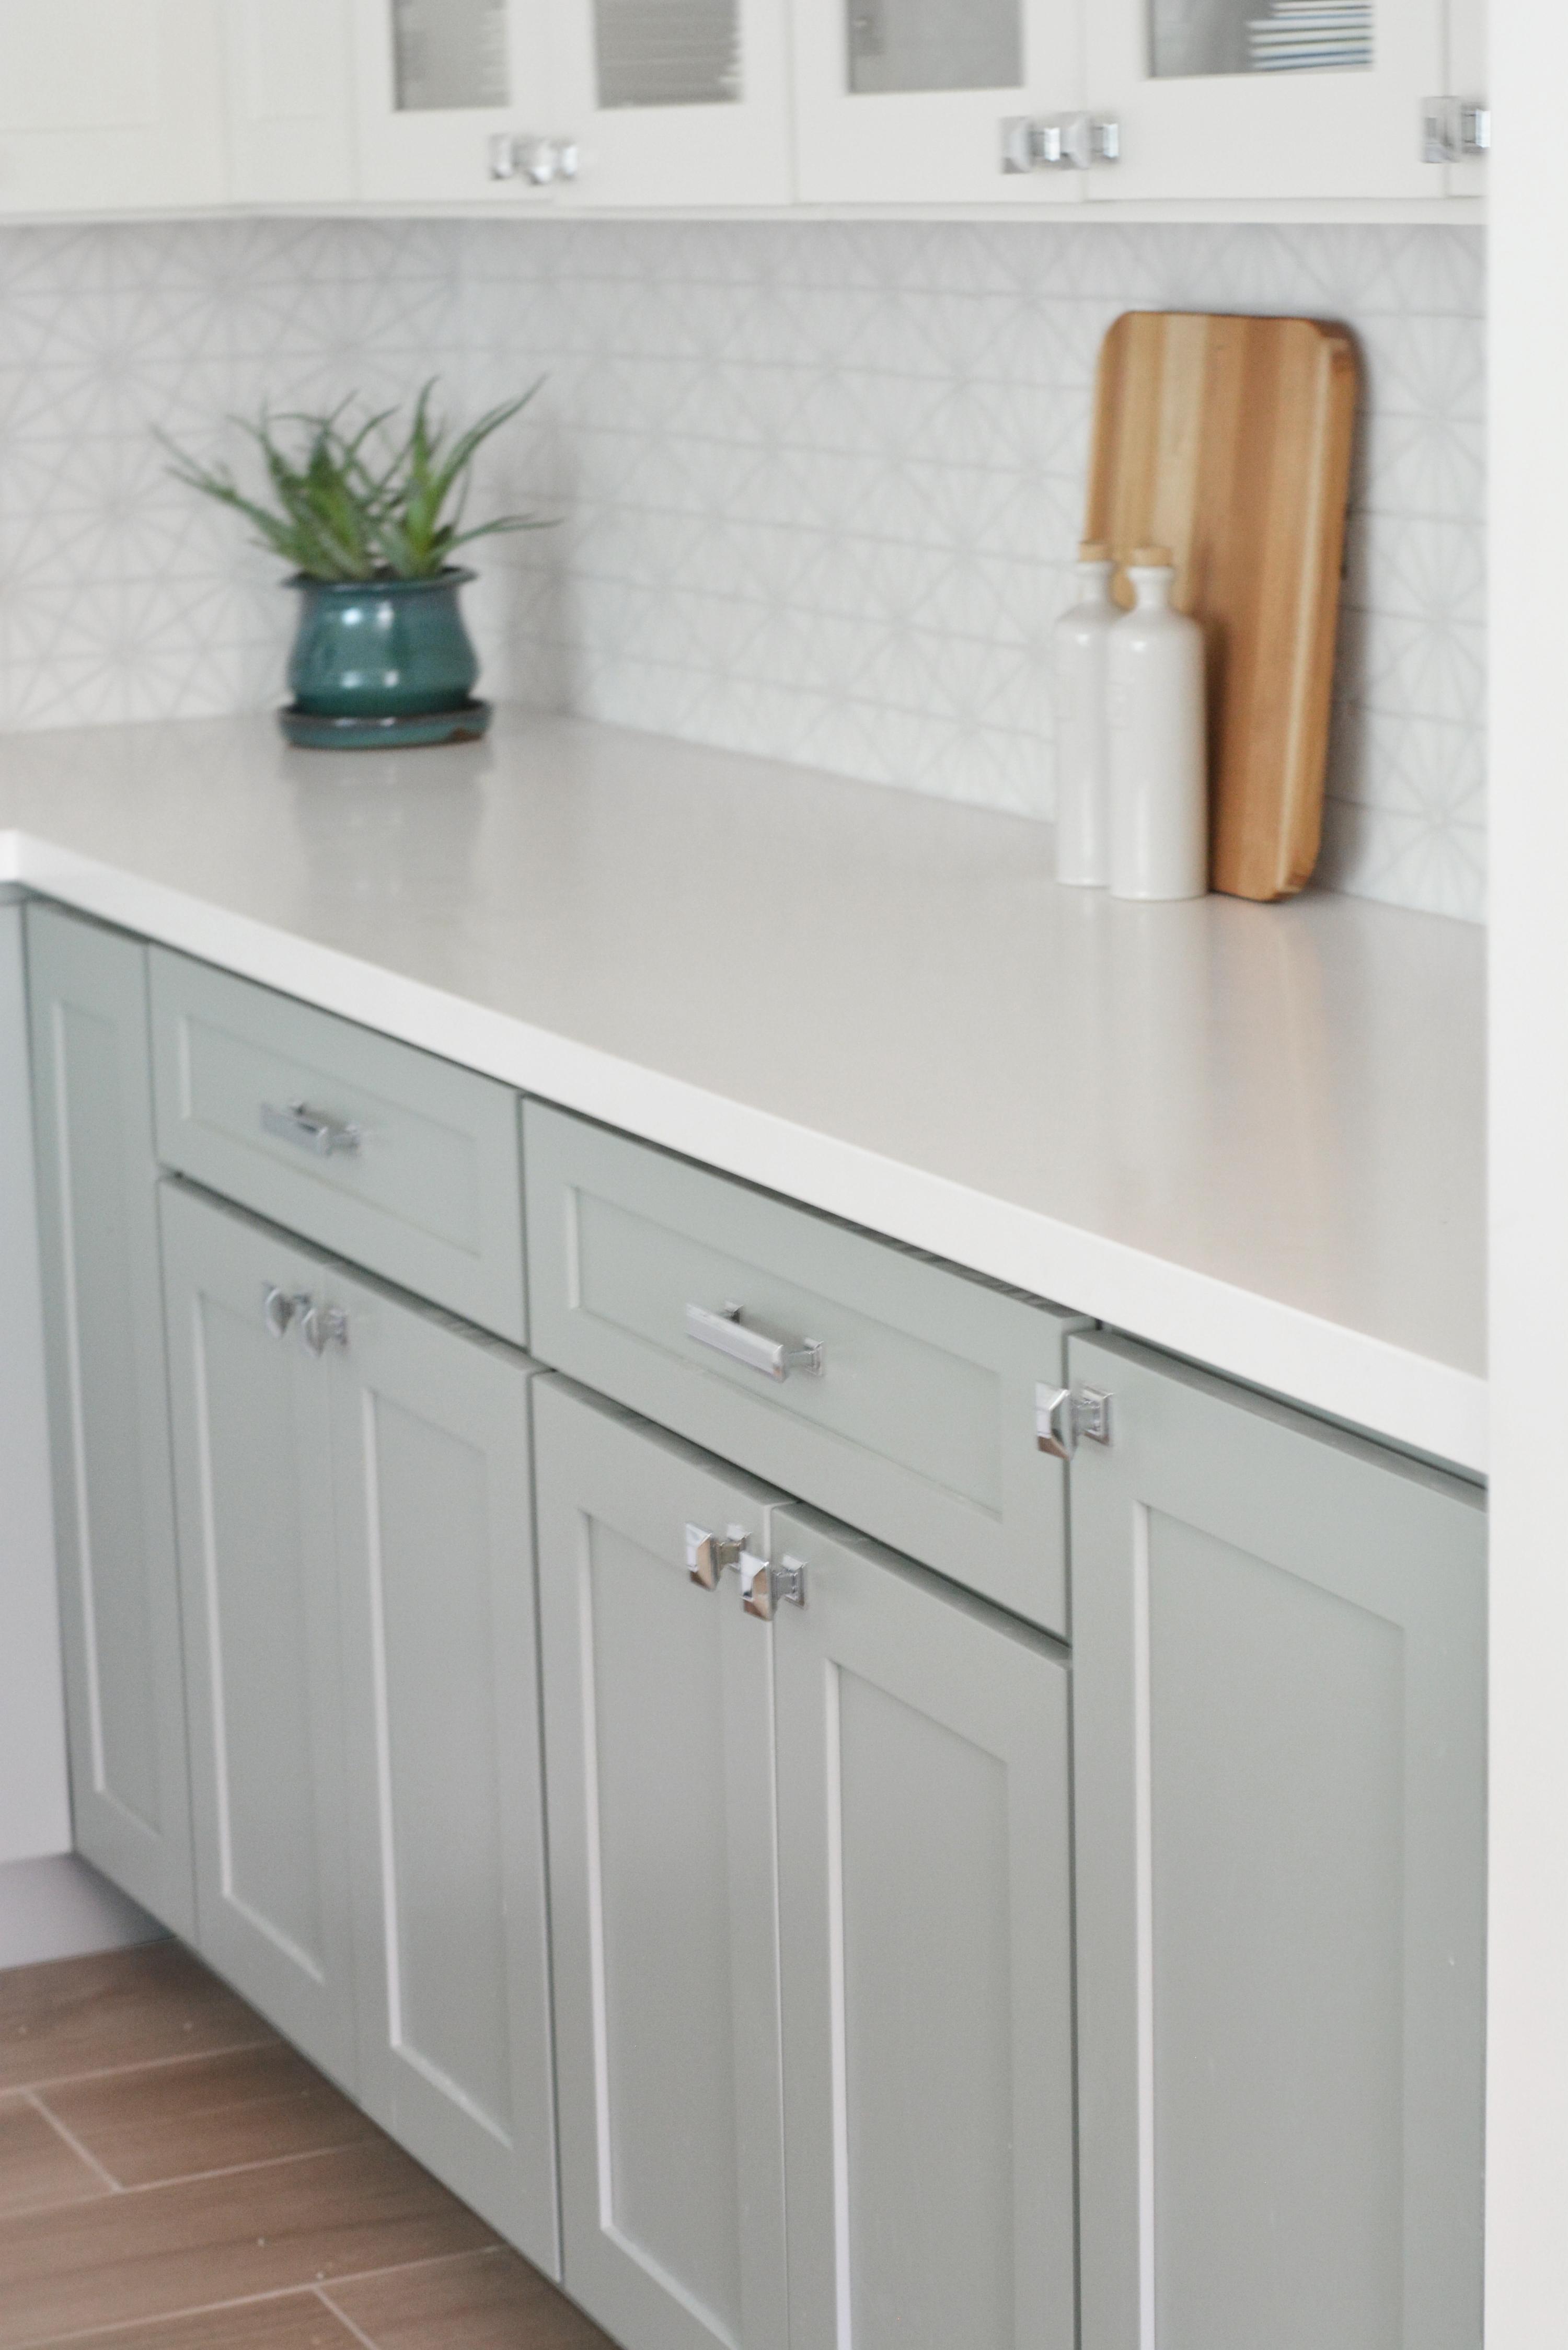 Wonderful Standard Depth Of Kitchen Countertops #6: Caesarstone-pure-white-quartz-countertops.jpg